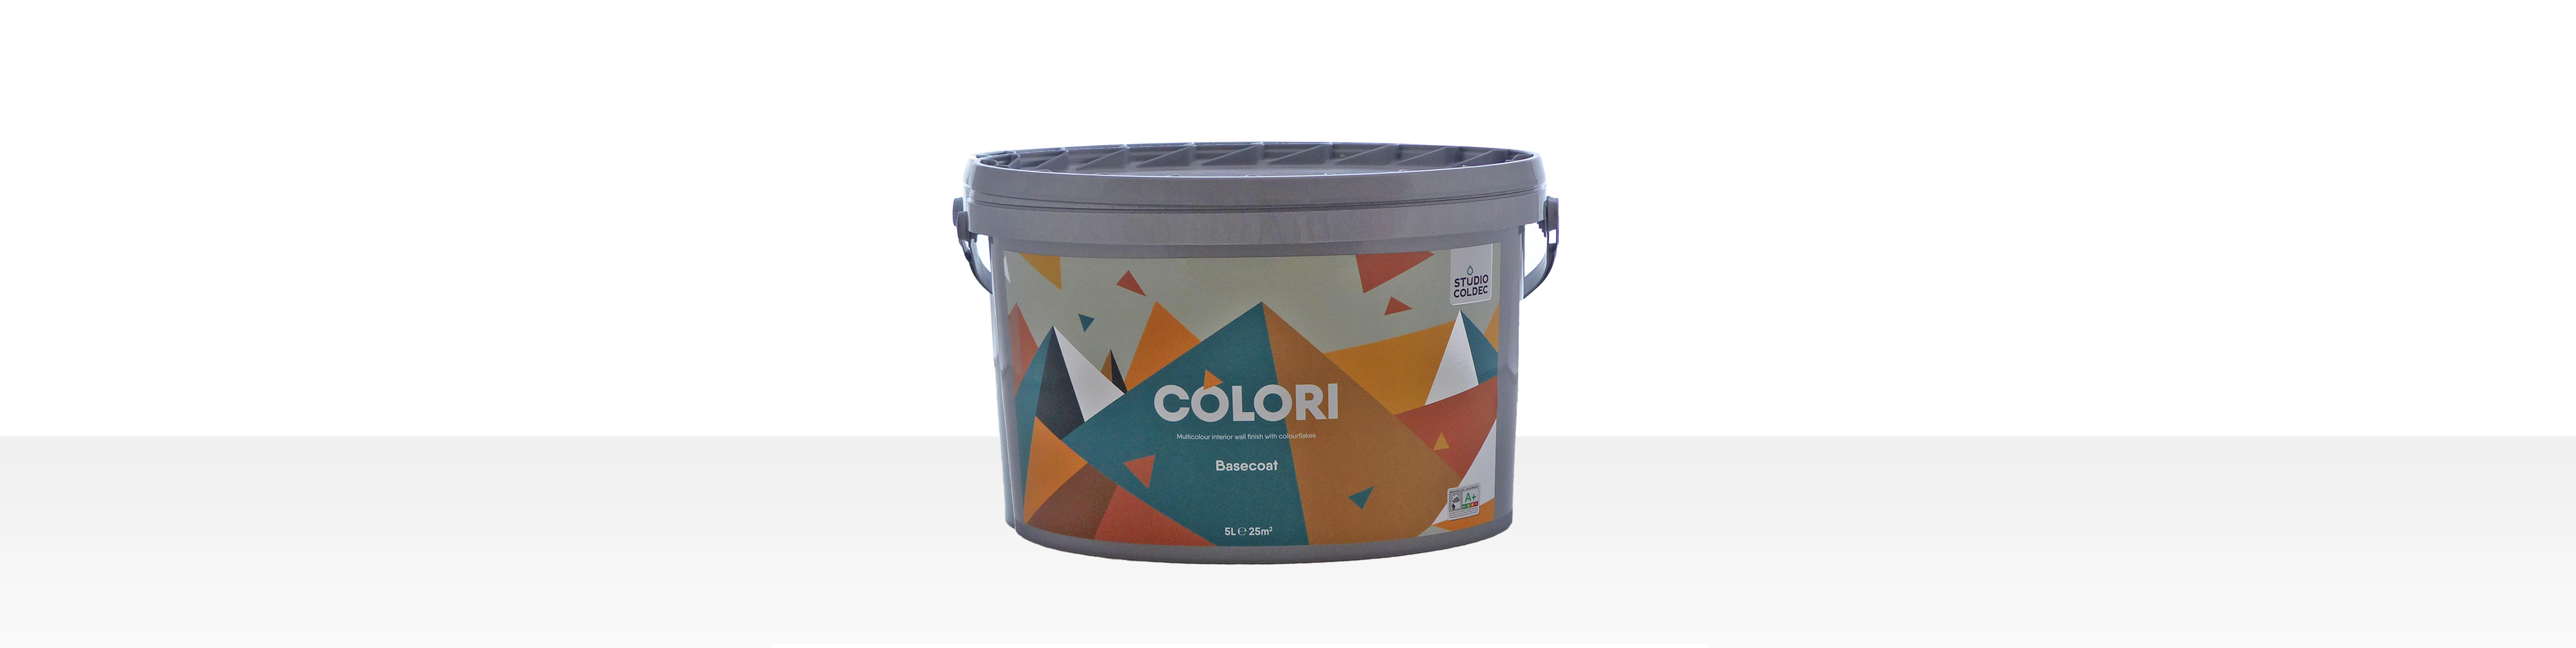 colori-producten